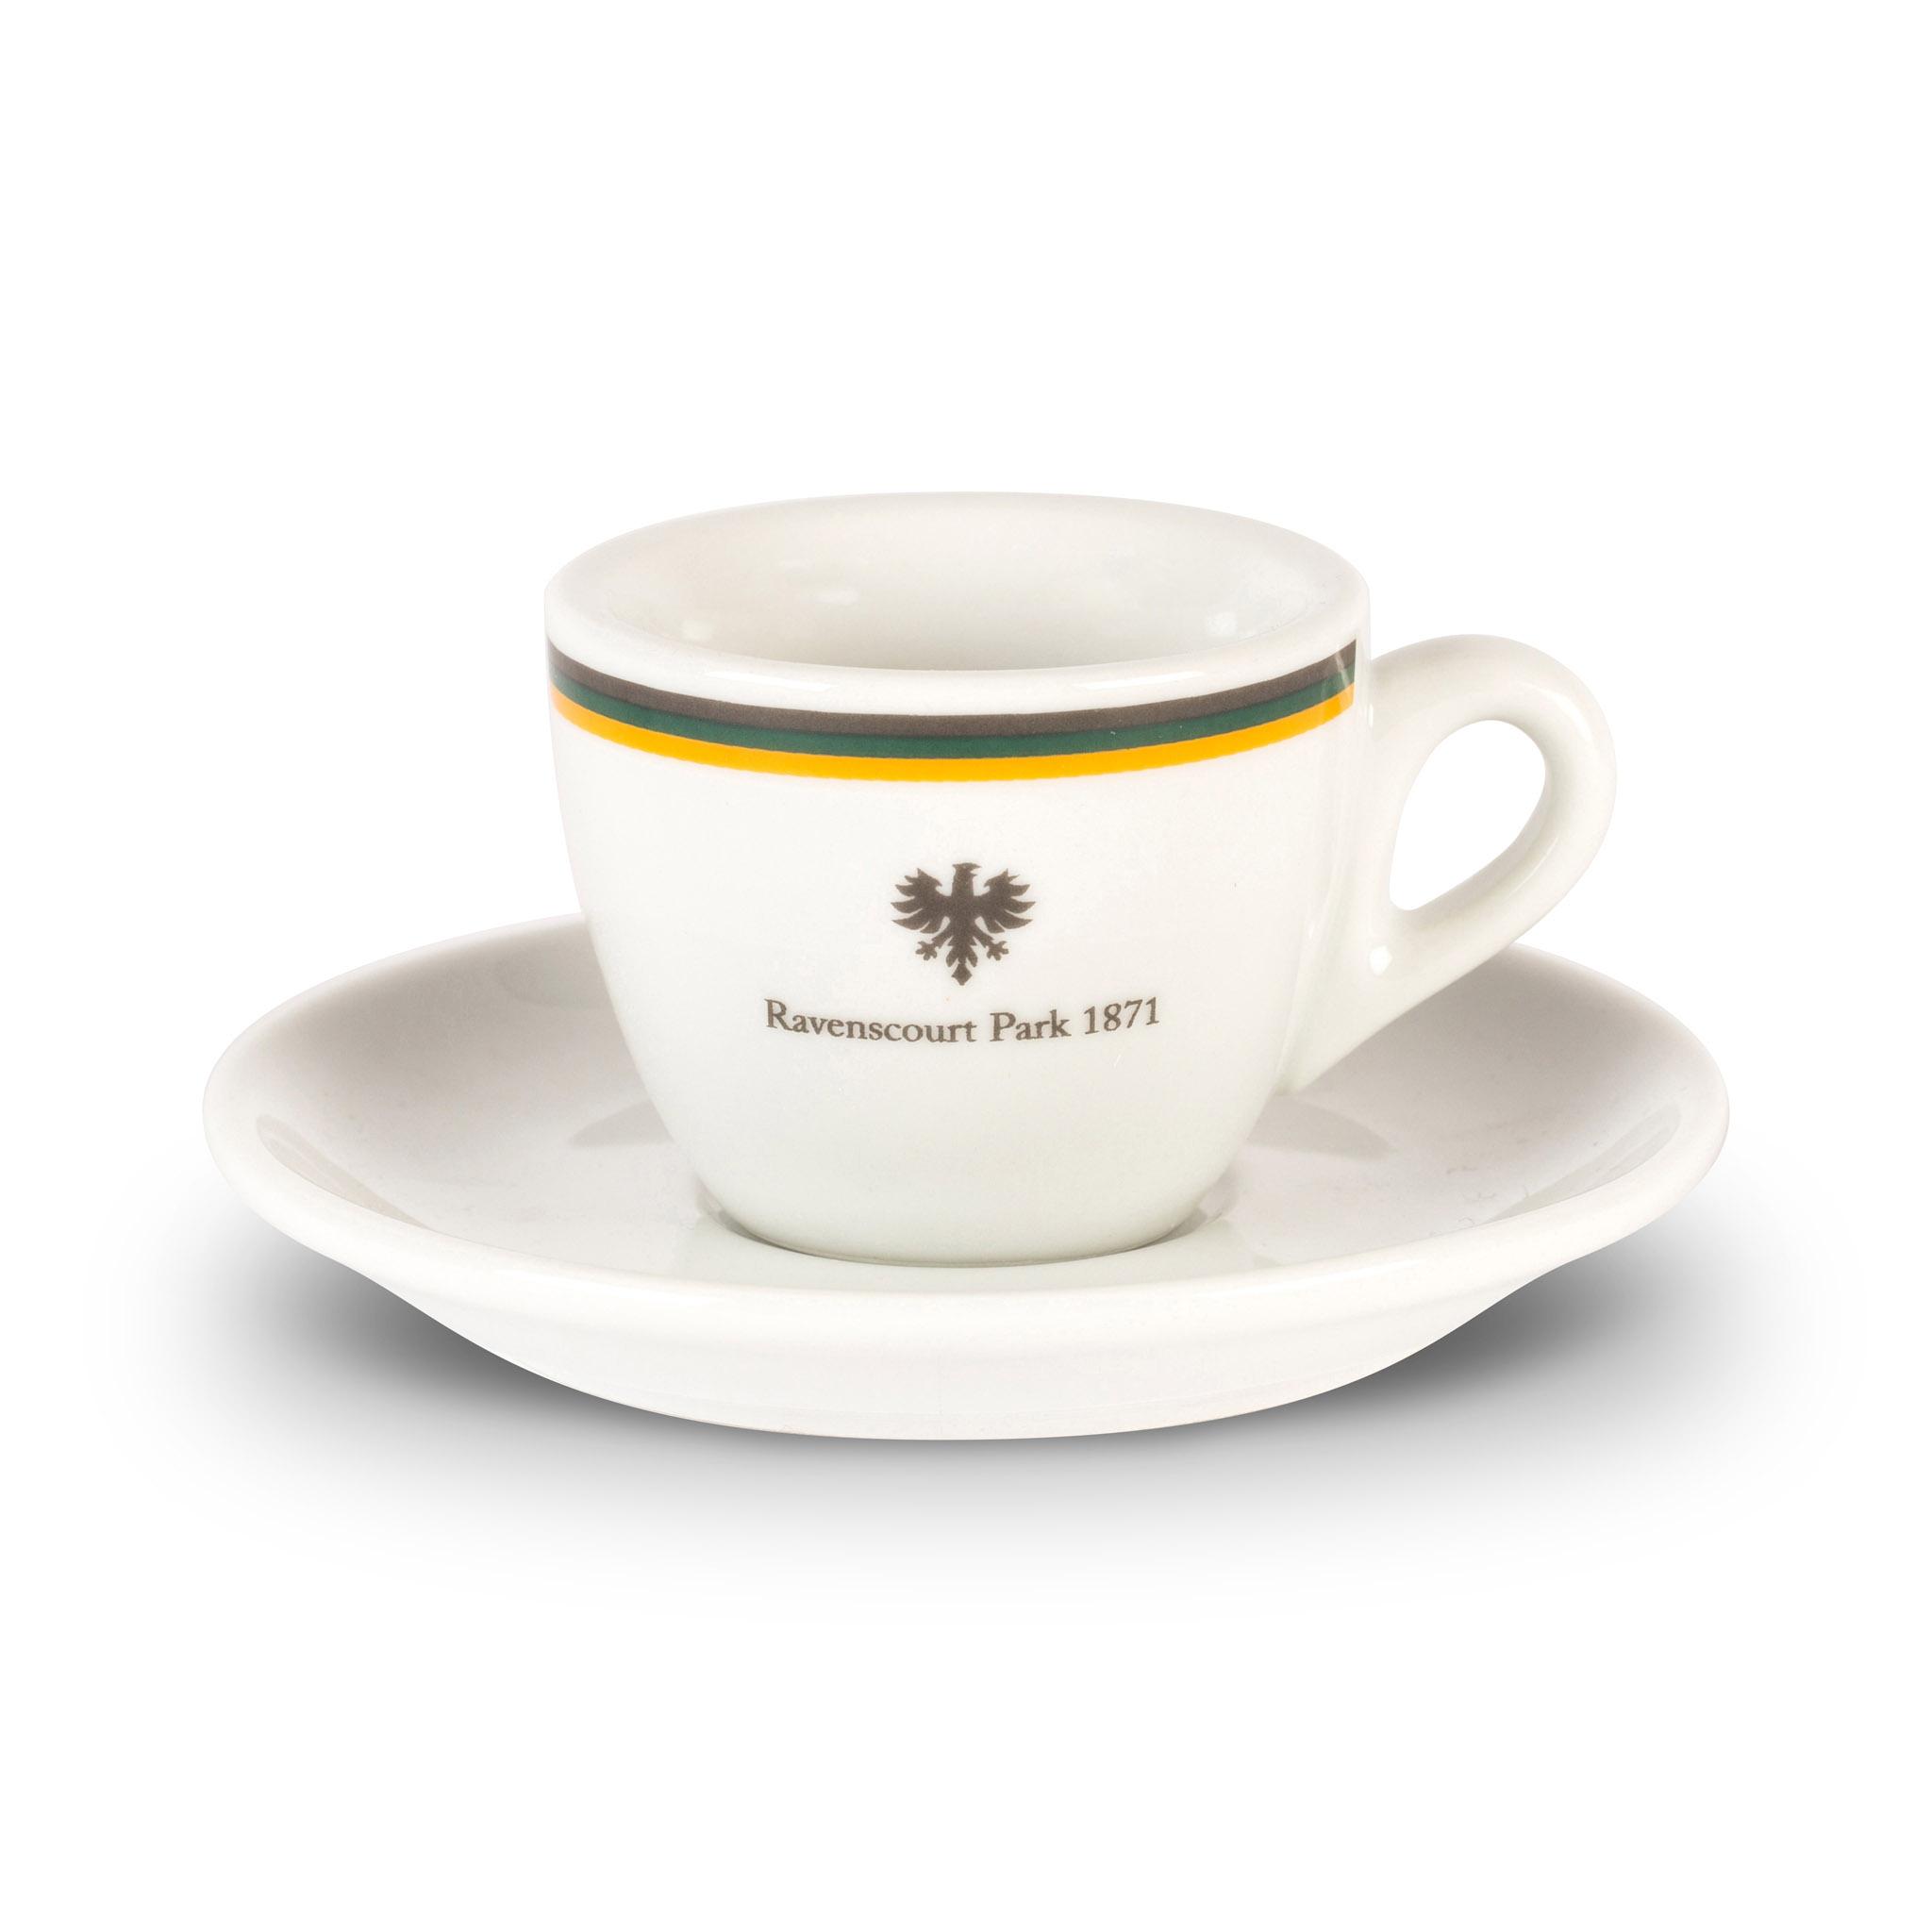 Ravenscourt Park espresso cup and saucer